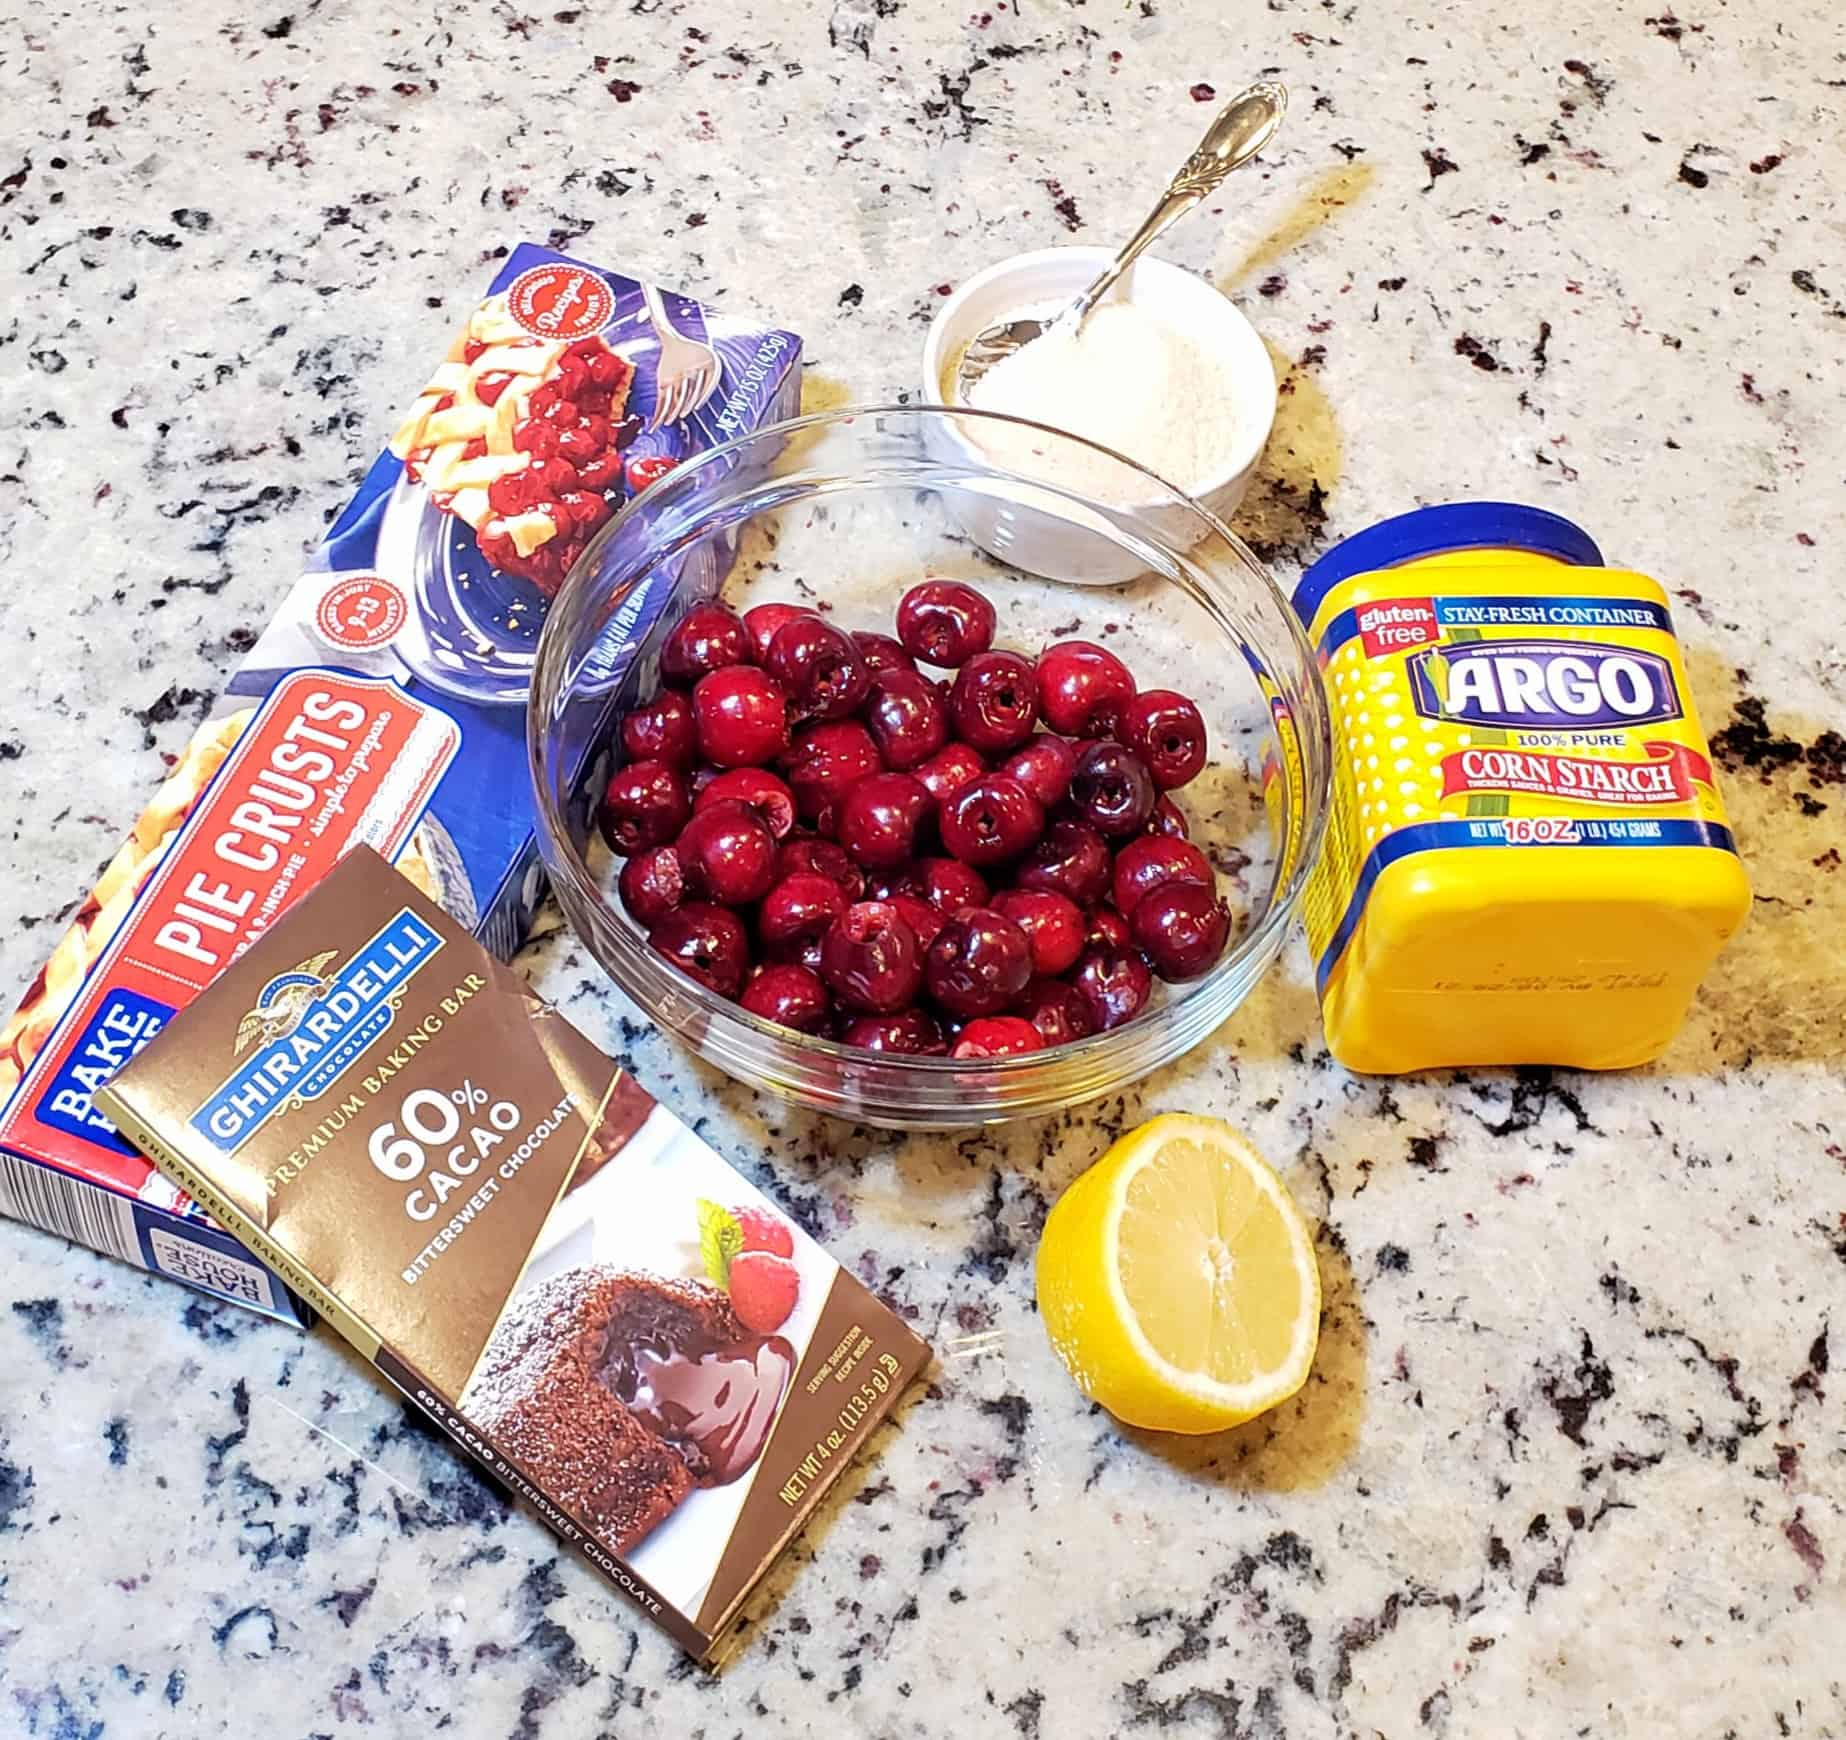 bowl of fresh cherries, lemon, cornstarch, chocolate bar and box of pie crust on a granite surface